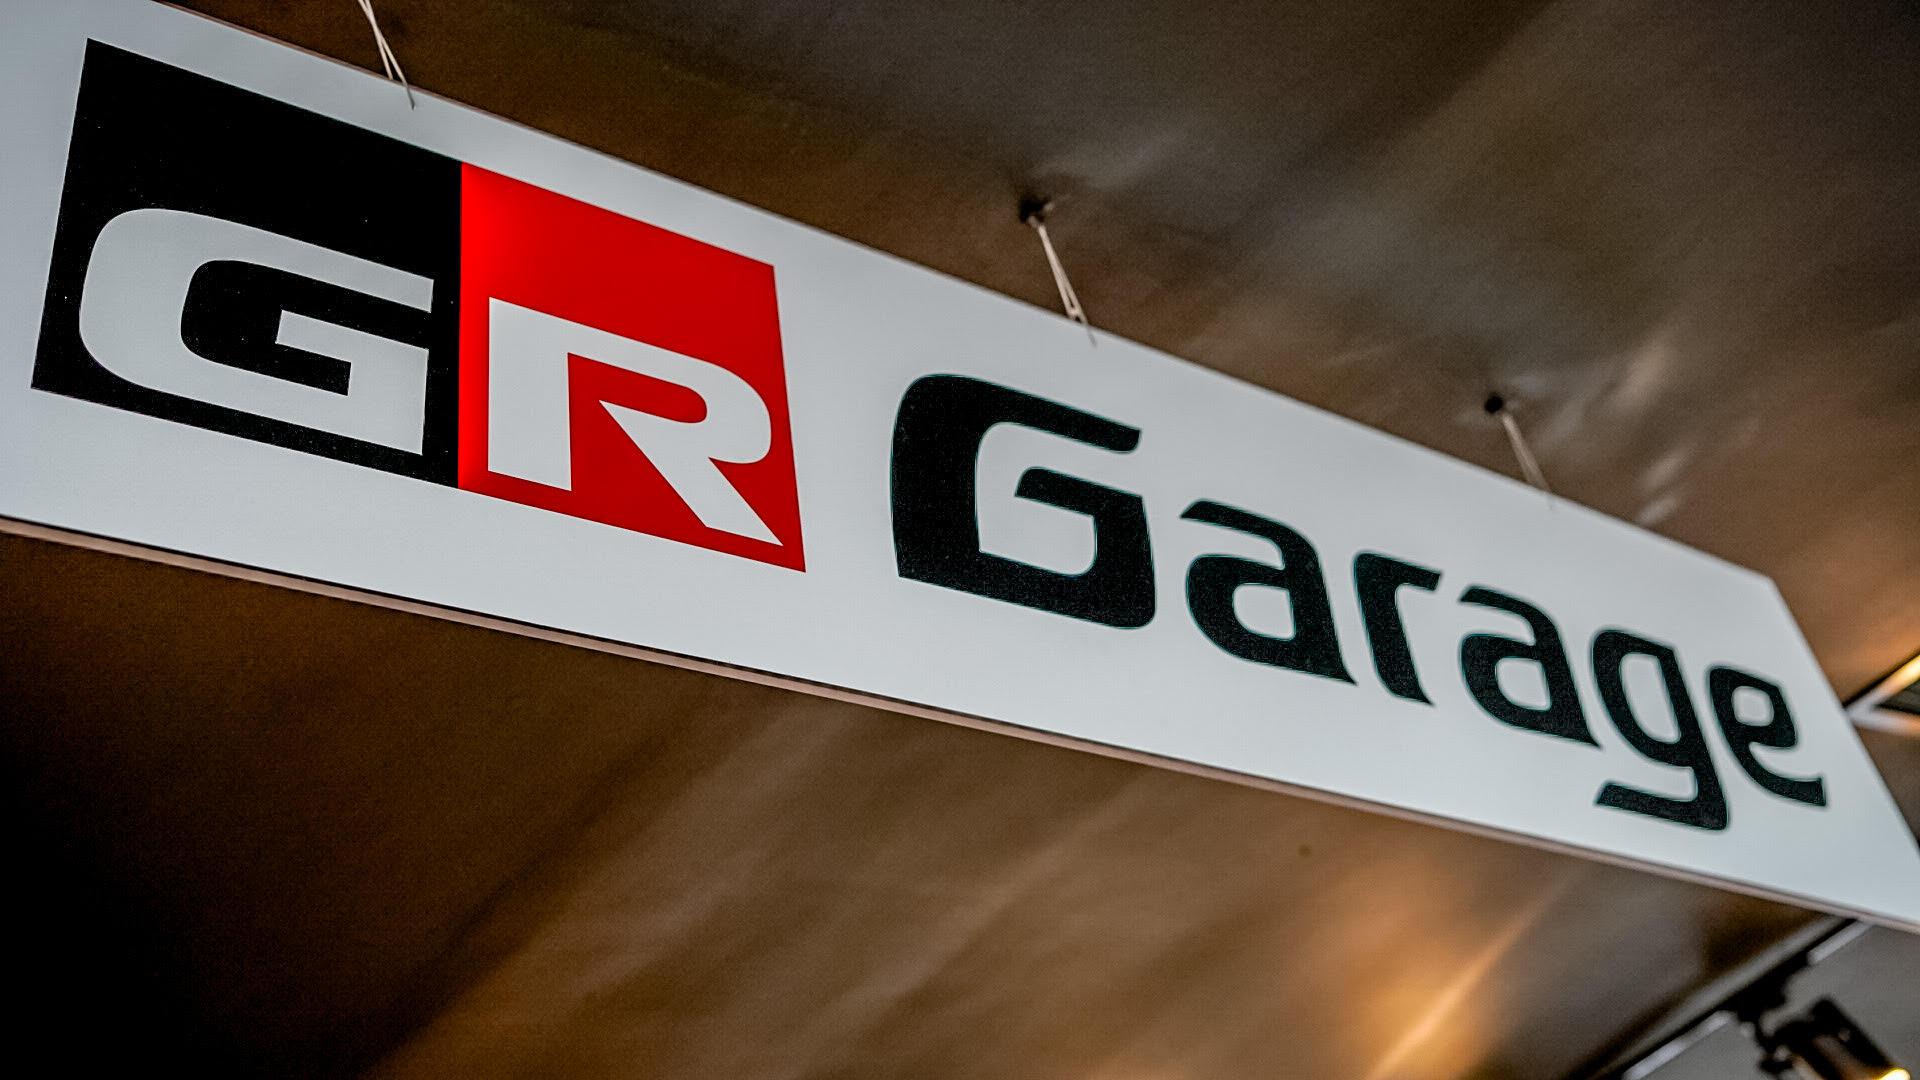 GR Gazoo Toyota